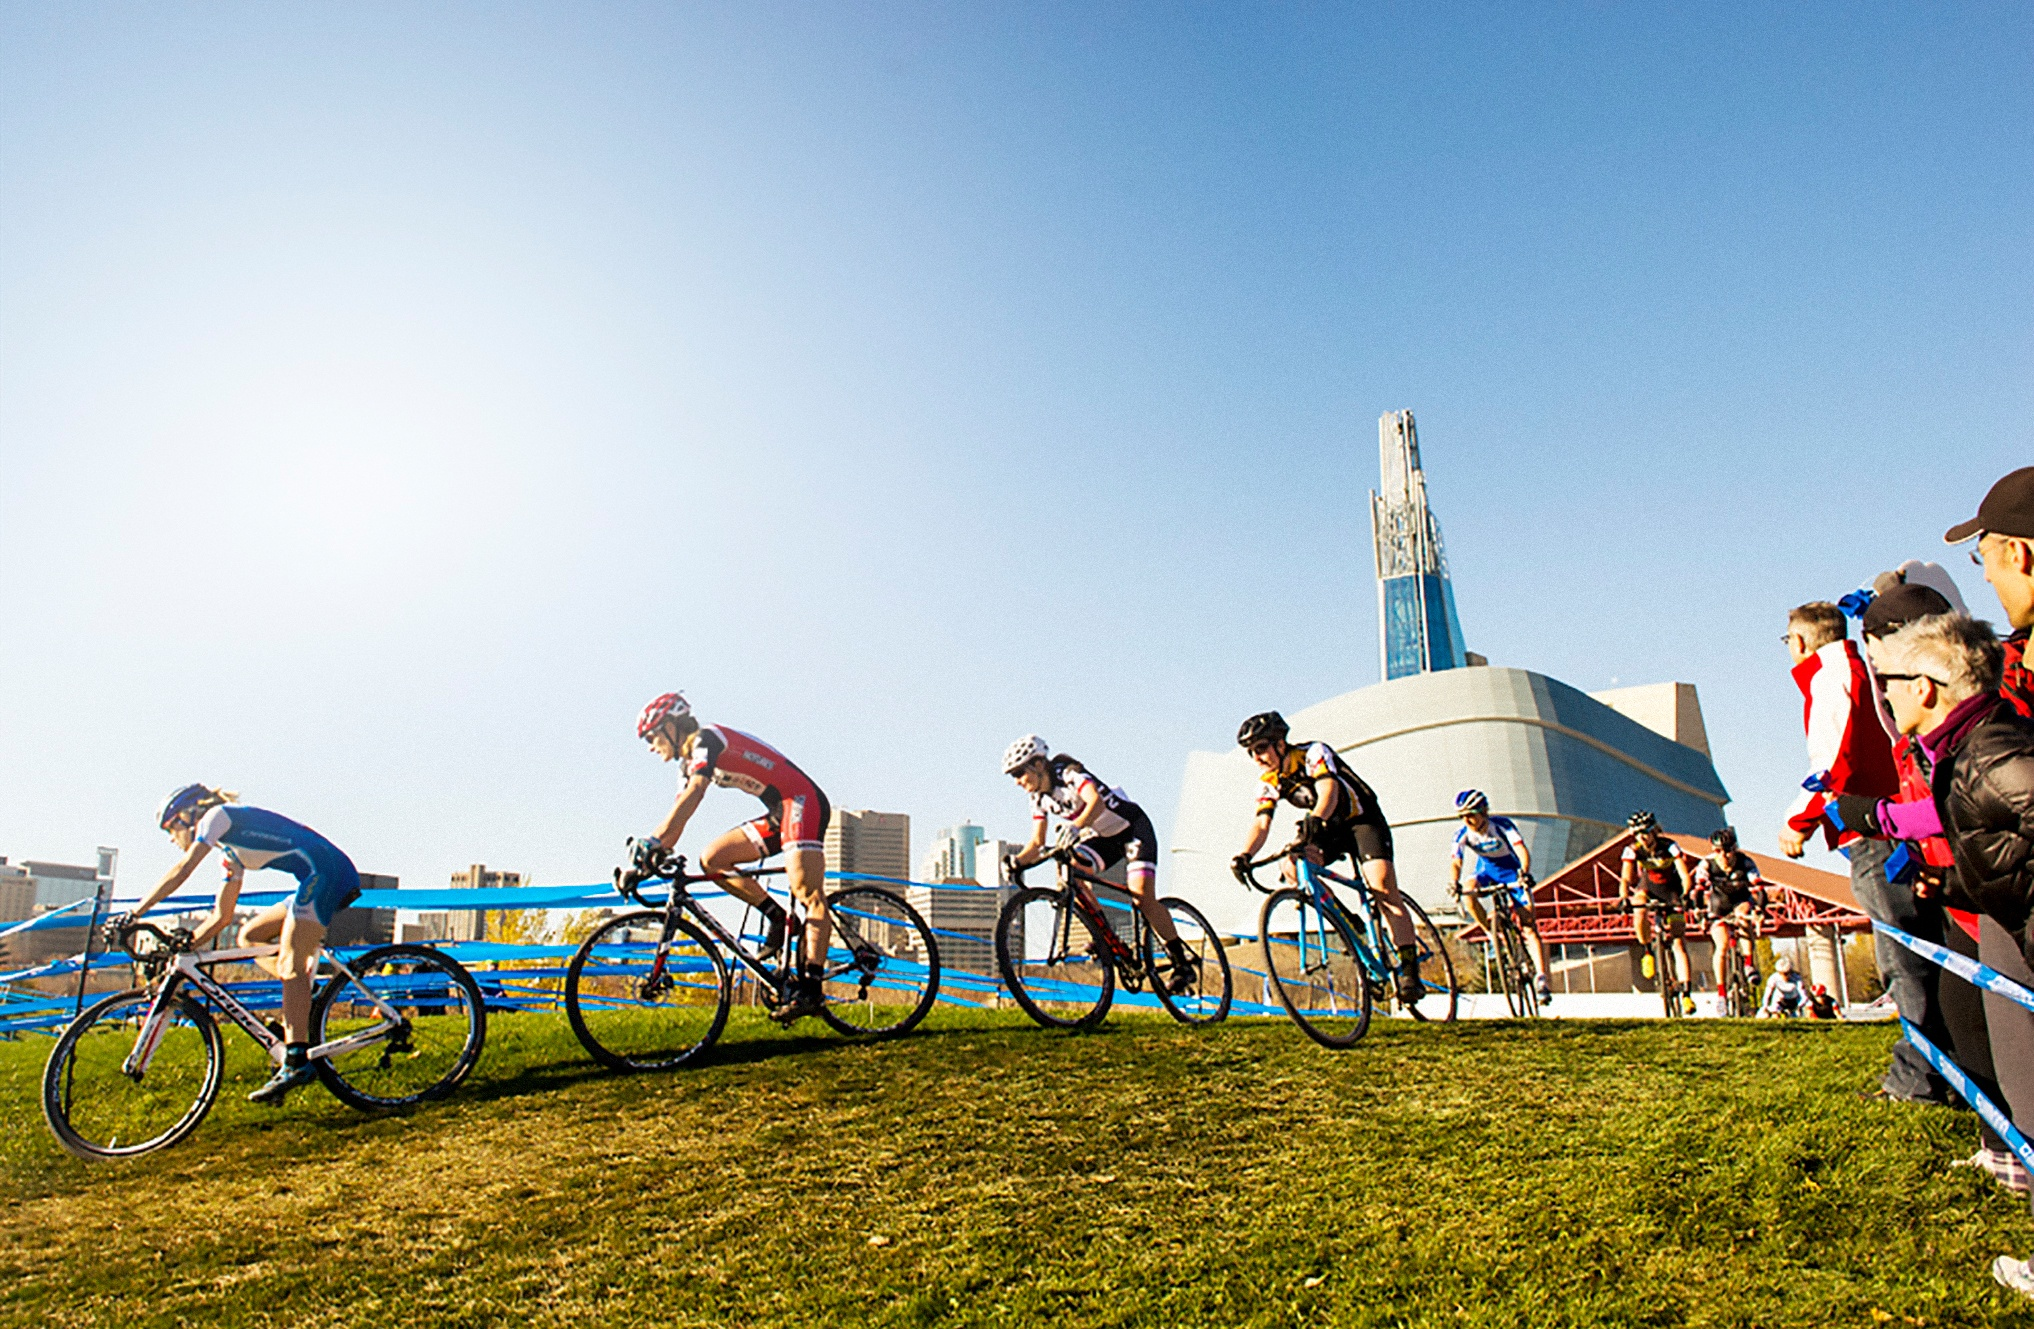 CMX Cyclocross Nationals cyclists race